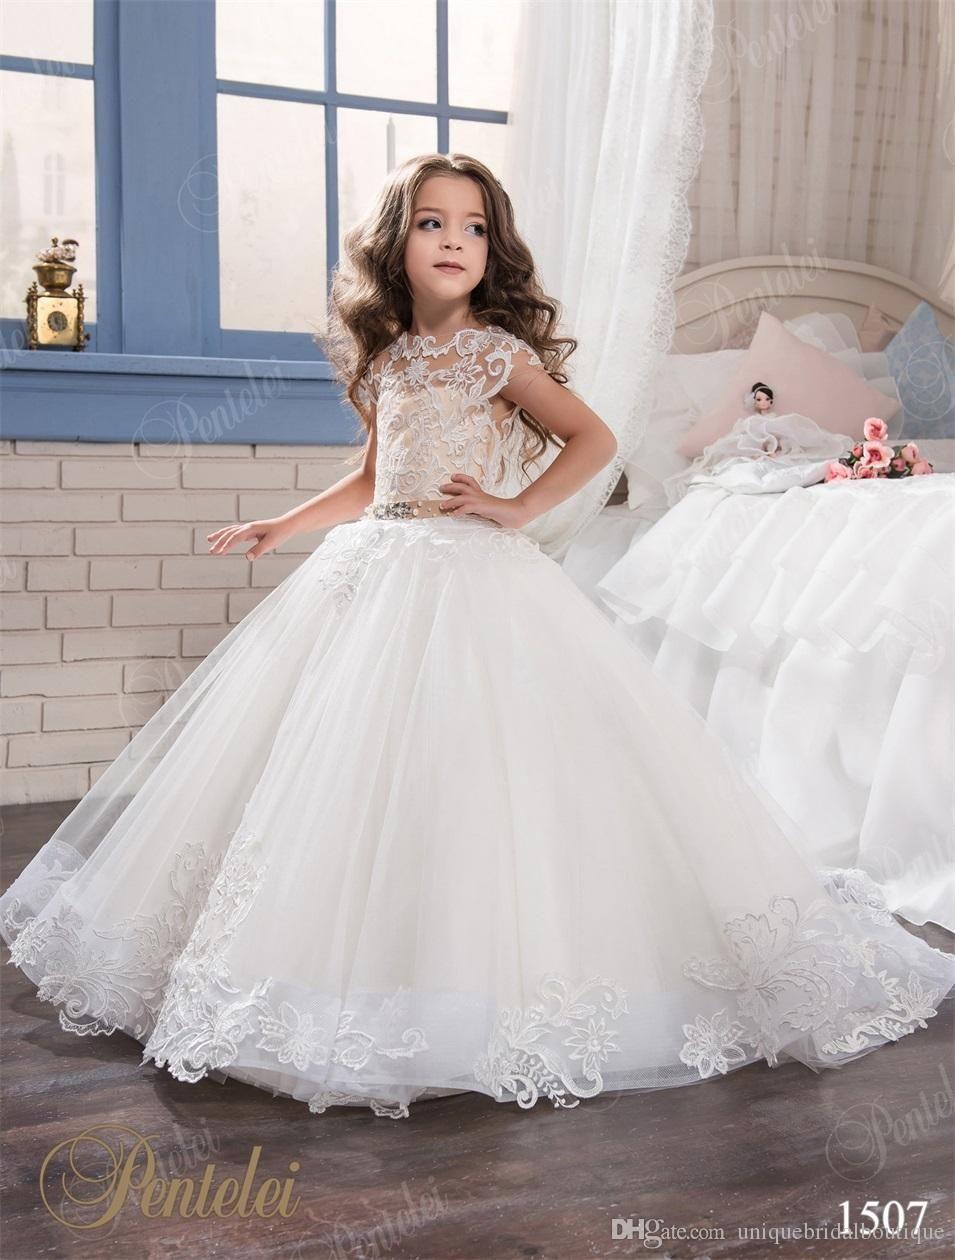 Kids wedding dresses pentelei with cap sleeves and sweep train